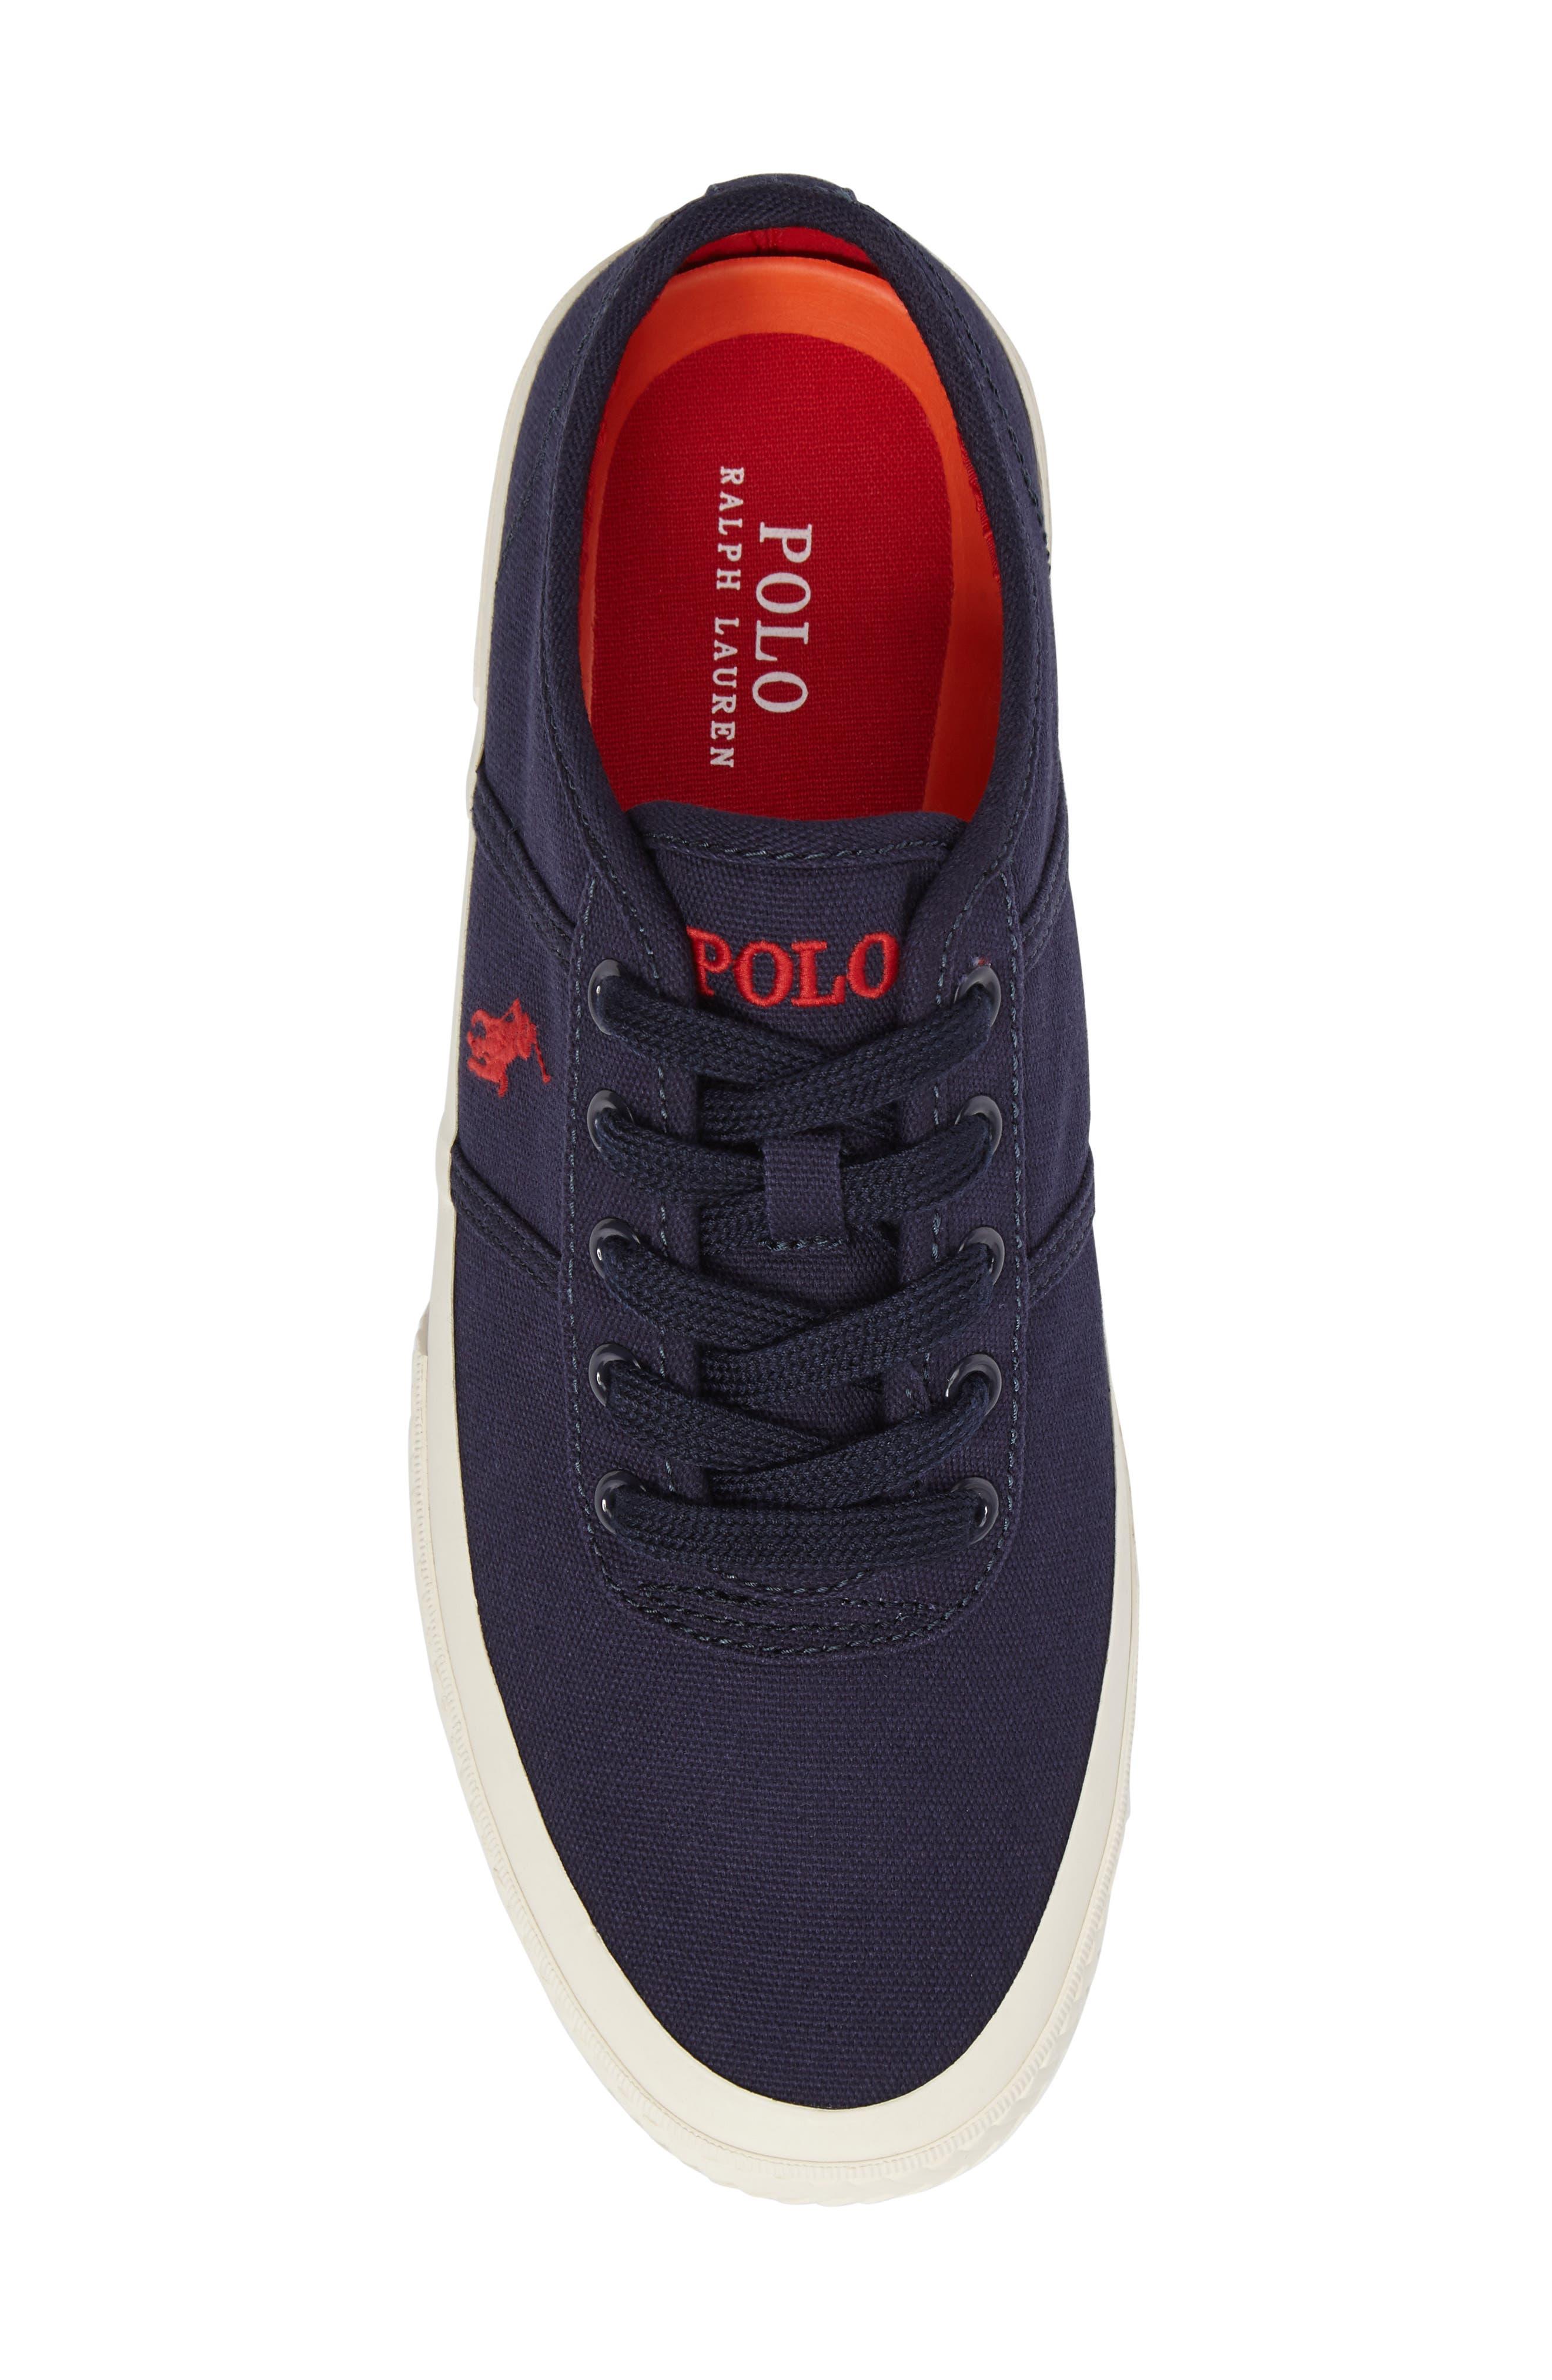 Polo Ralph Lauren Tyrian Sneaker,                             Alternate thumbnail 5, color,                             Newport Navy